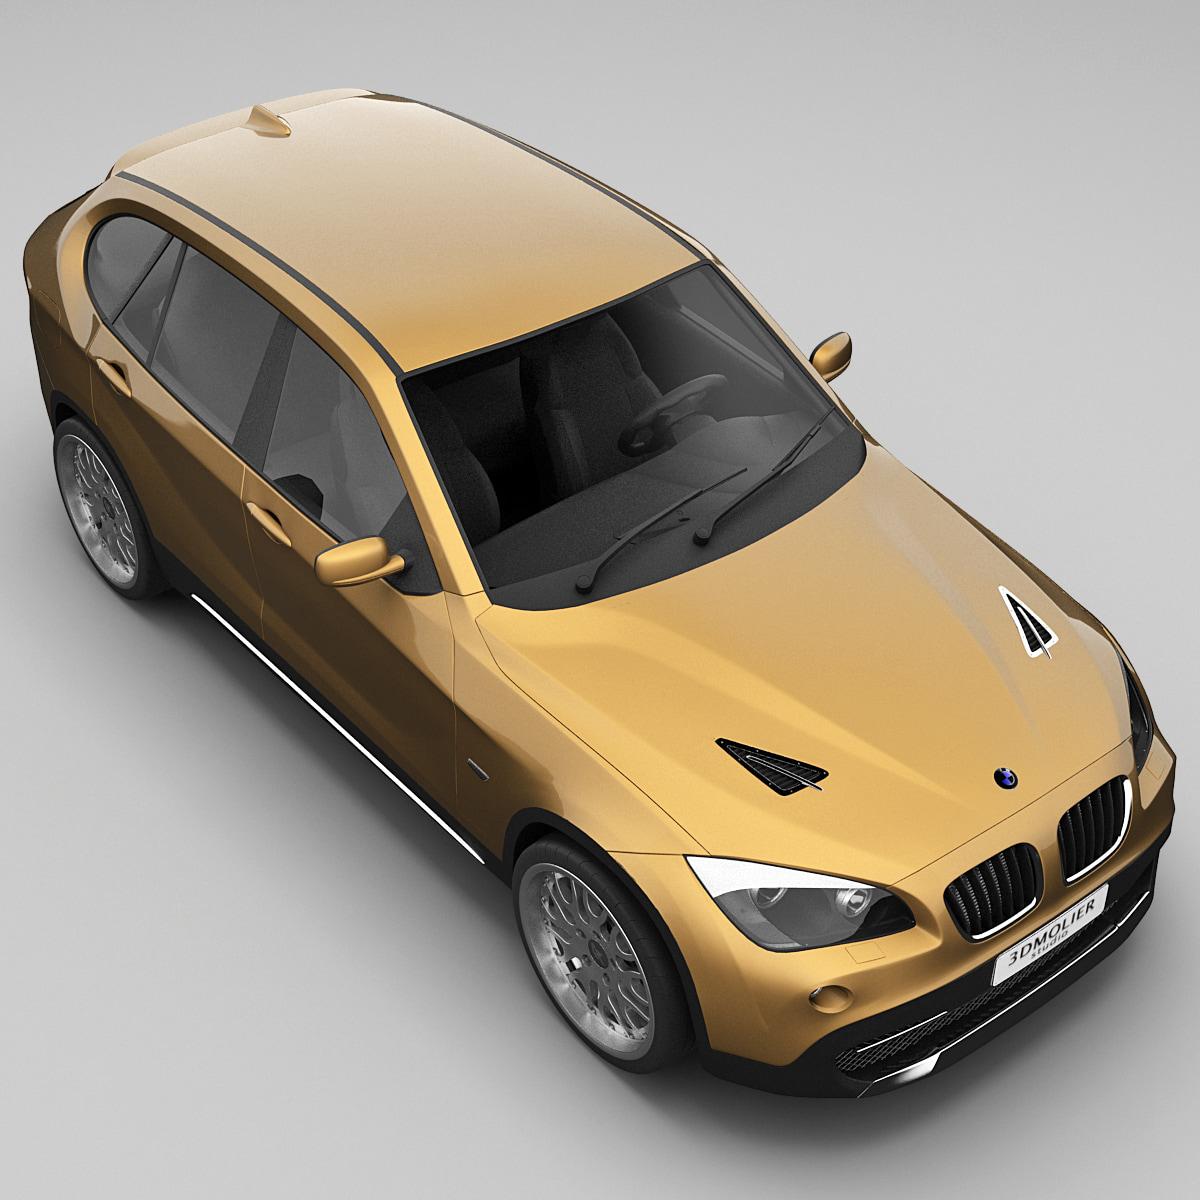 BMW_X1_E84_0001.jpg